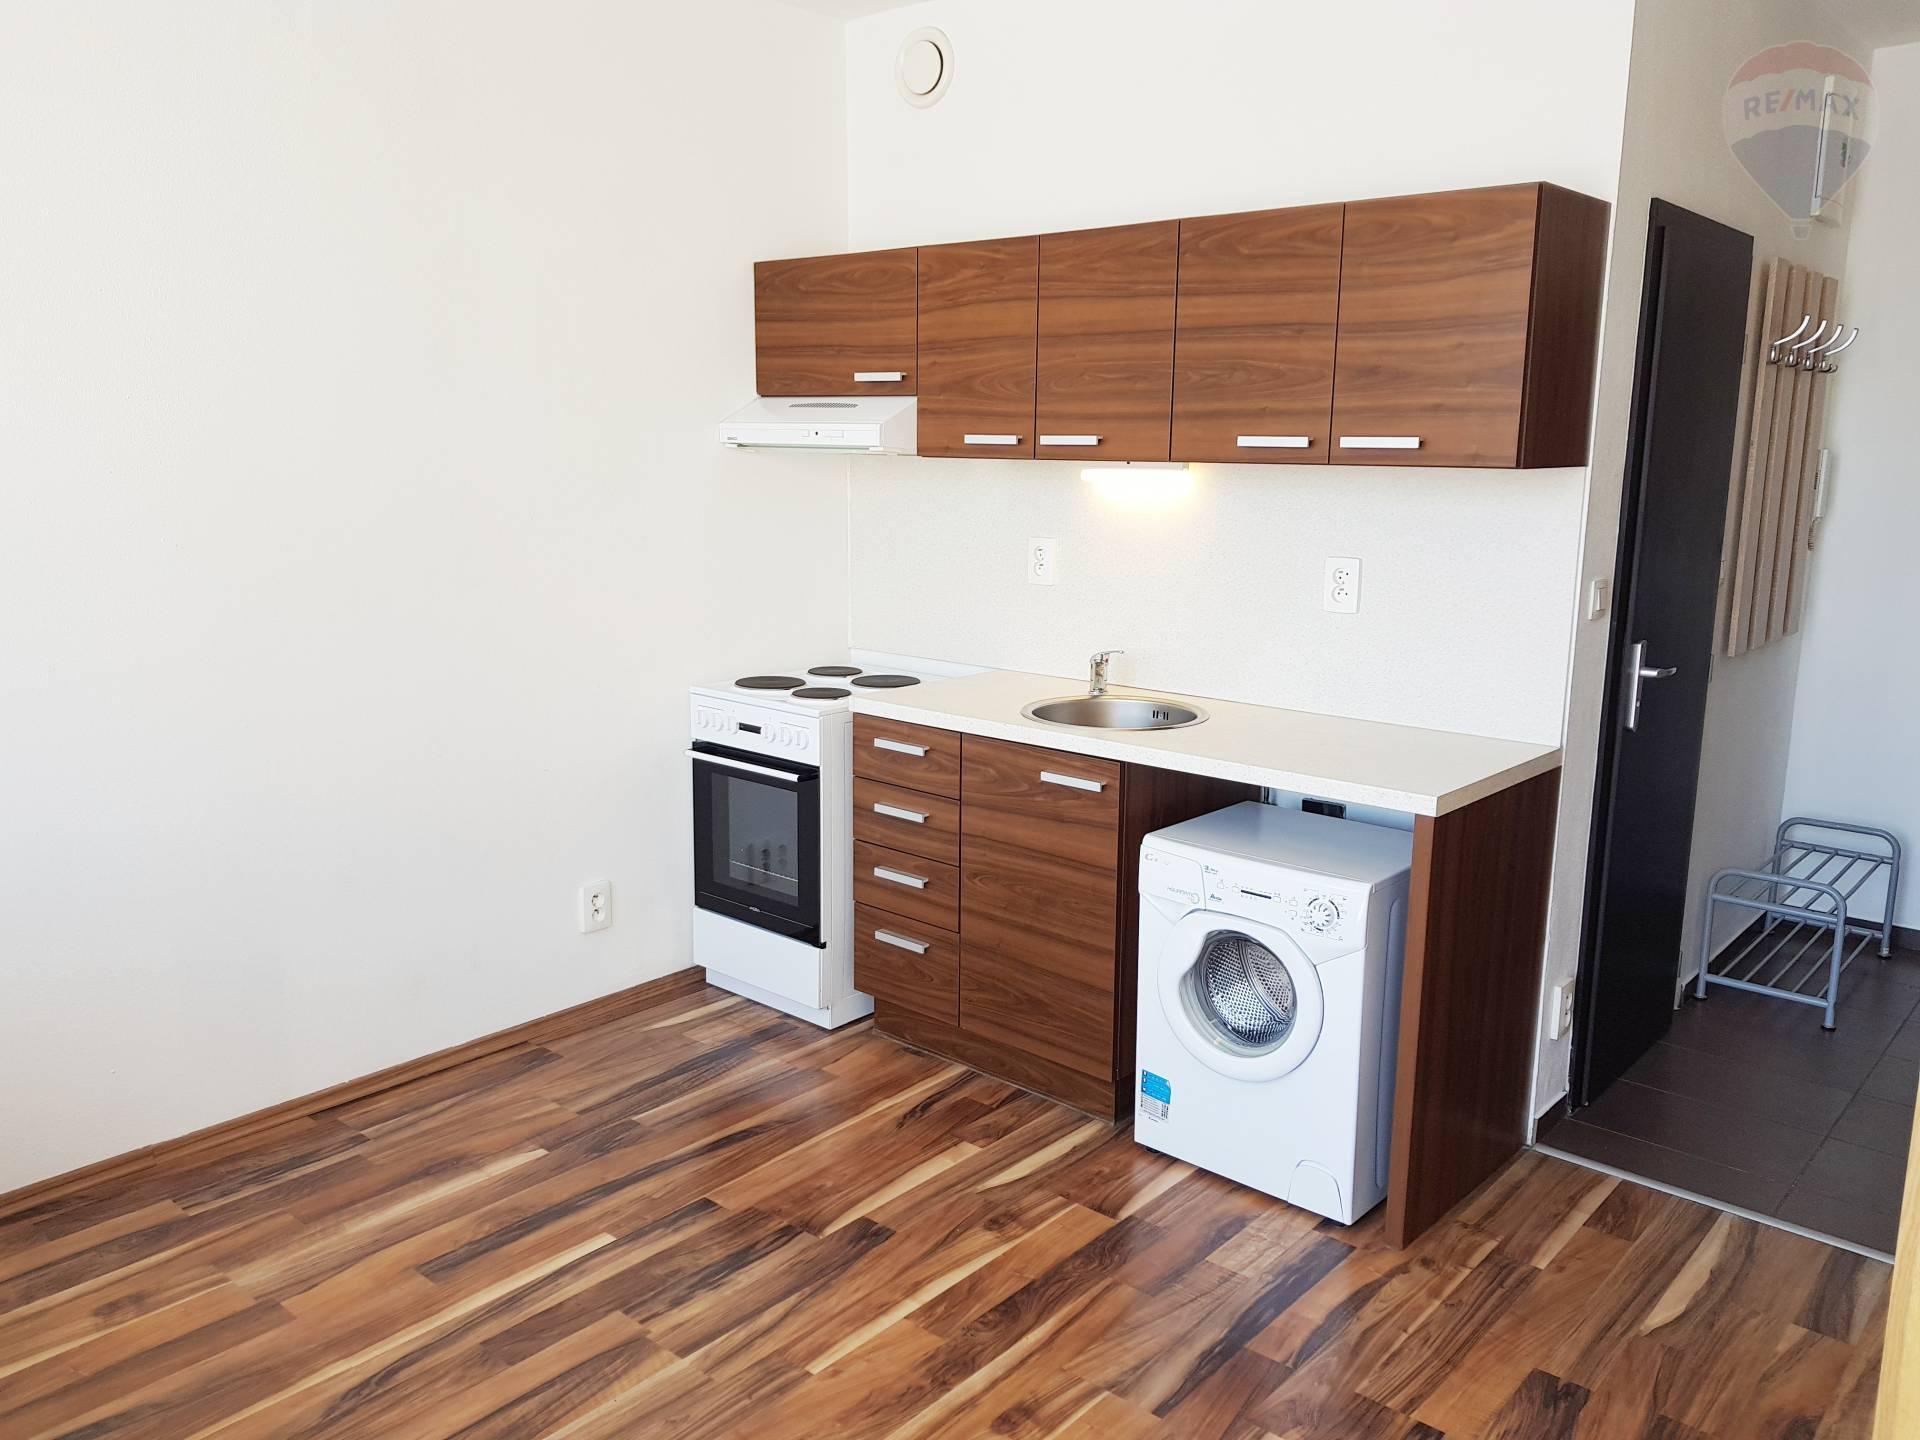 Predaj bytu (garsónka) 21 m2, Bratislava - Podunajské Biskupice -